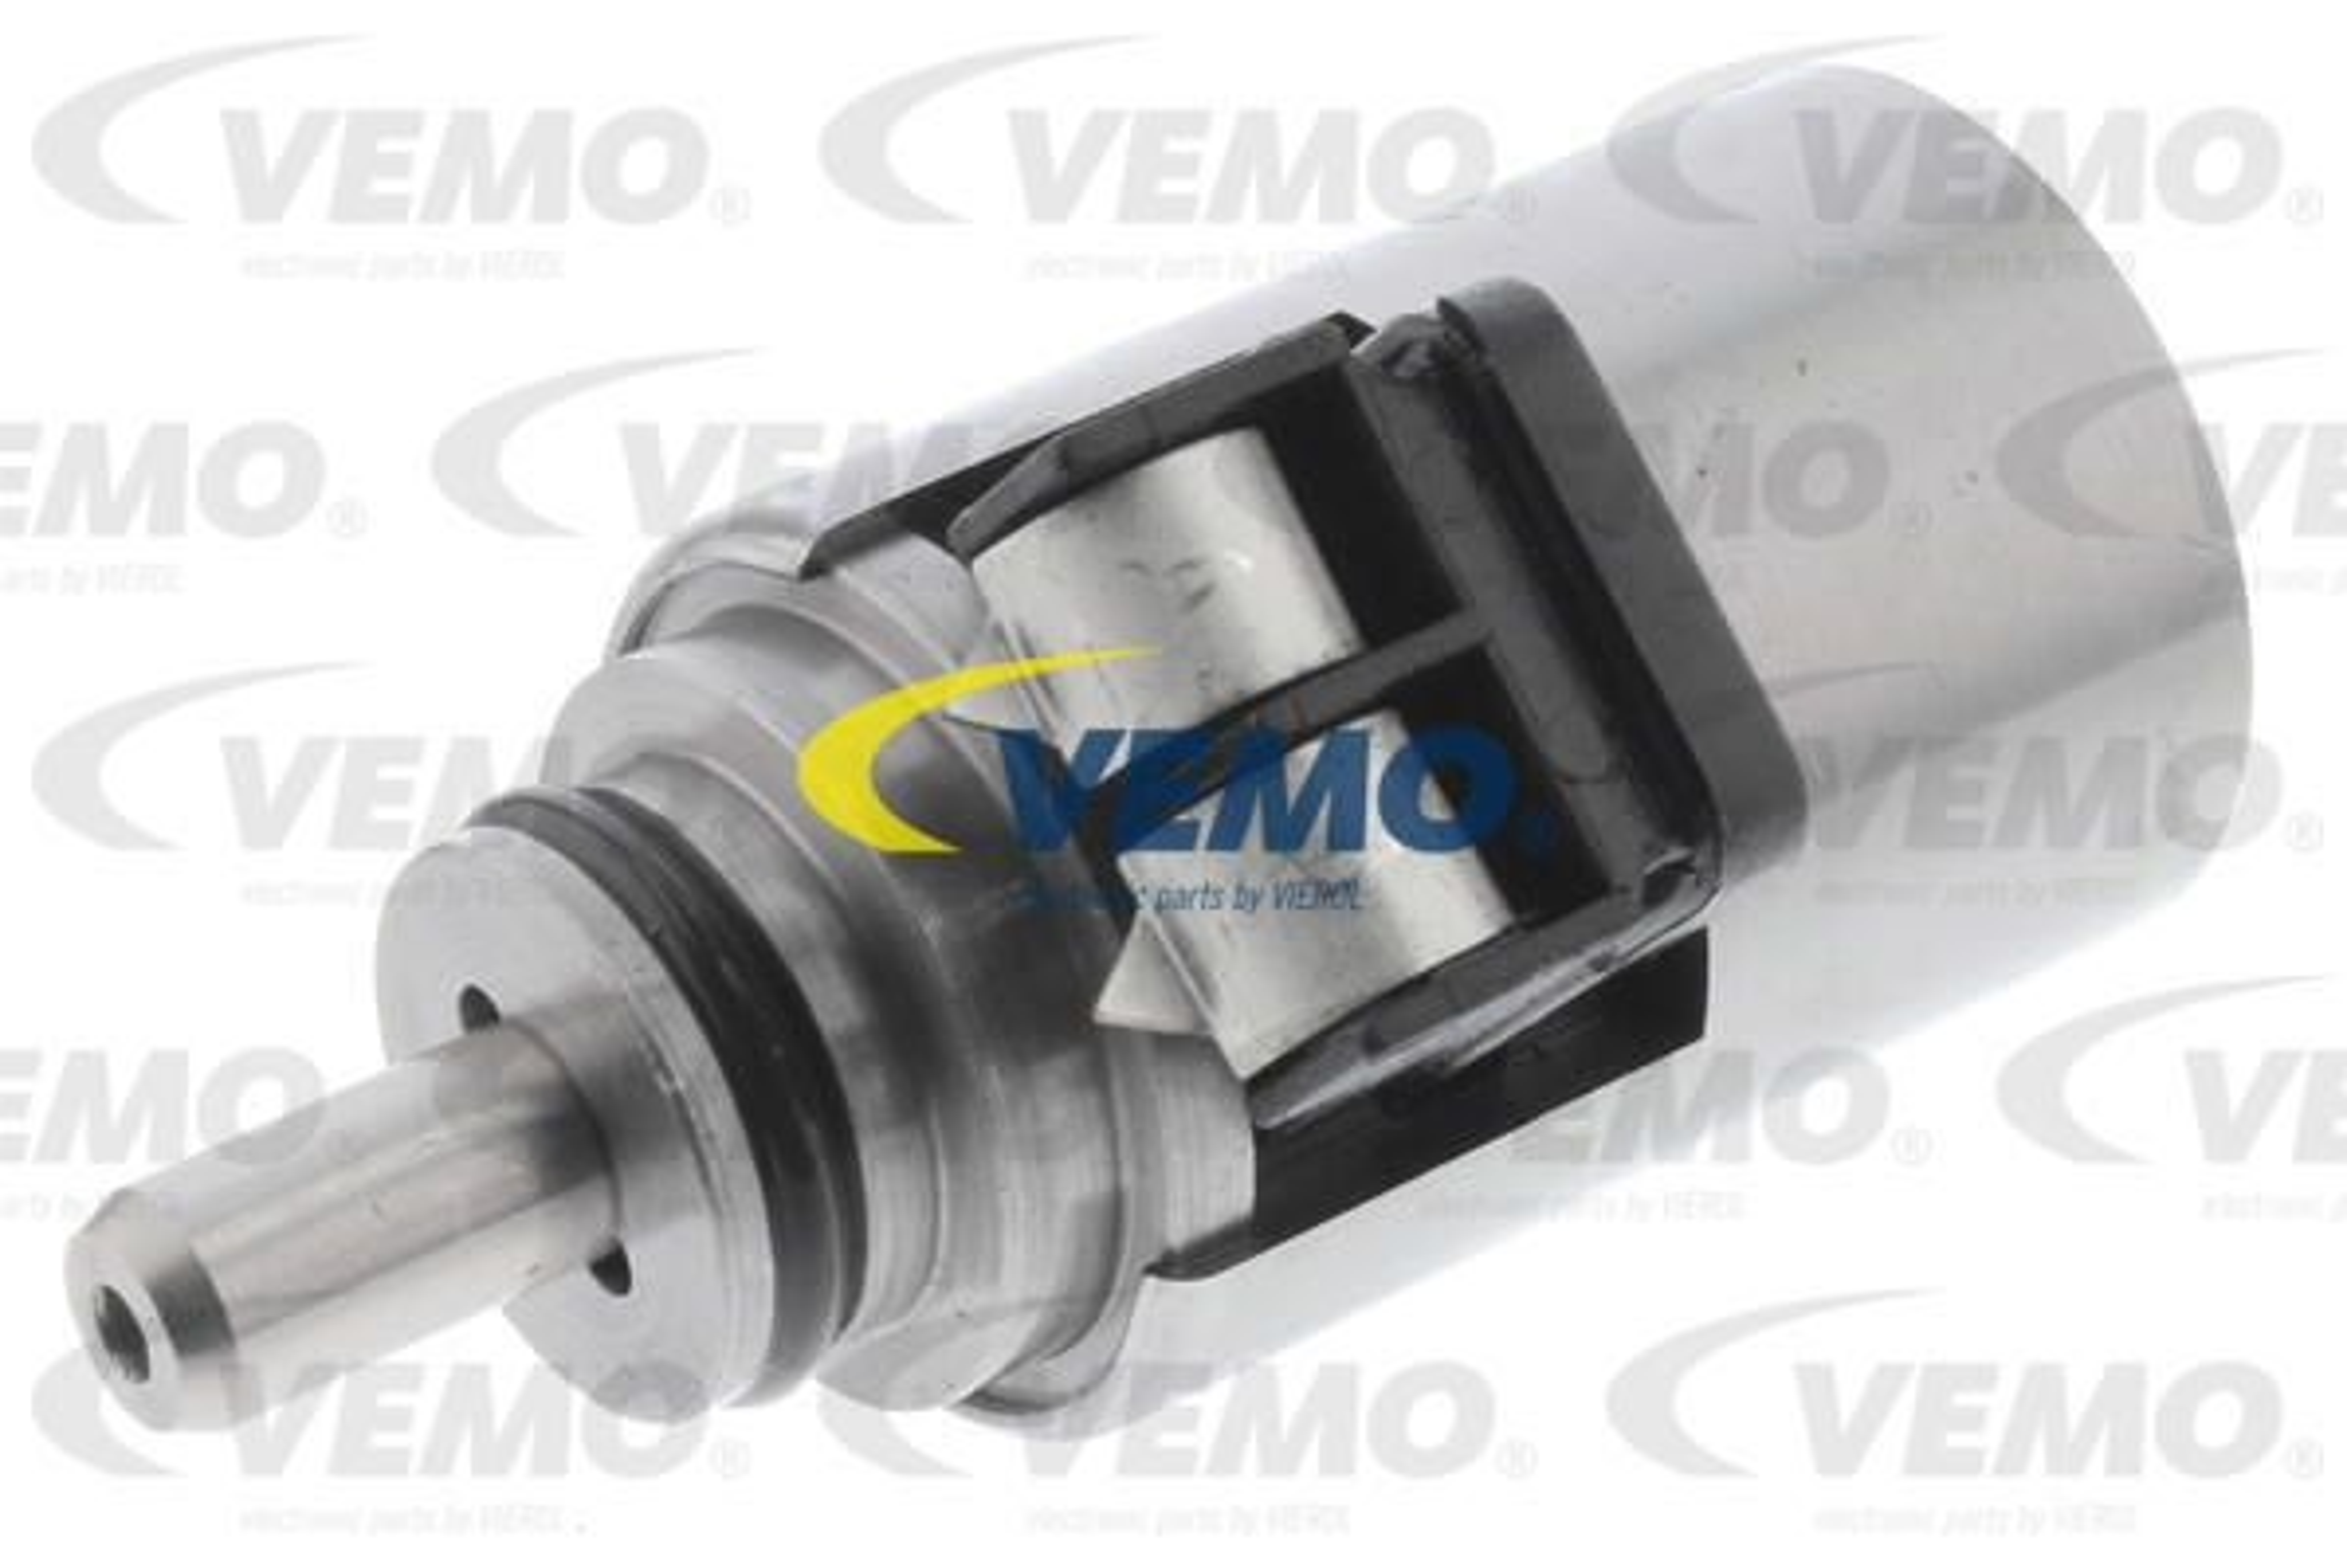 MERCEDES-BENZ S-Klasse 2021 Schaltventil, Automatikgetriebe - Original VEMO V30-77-1013